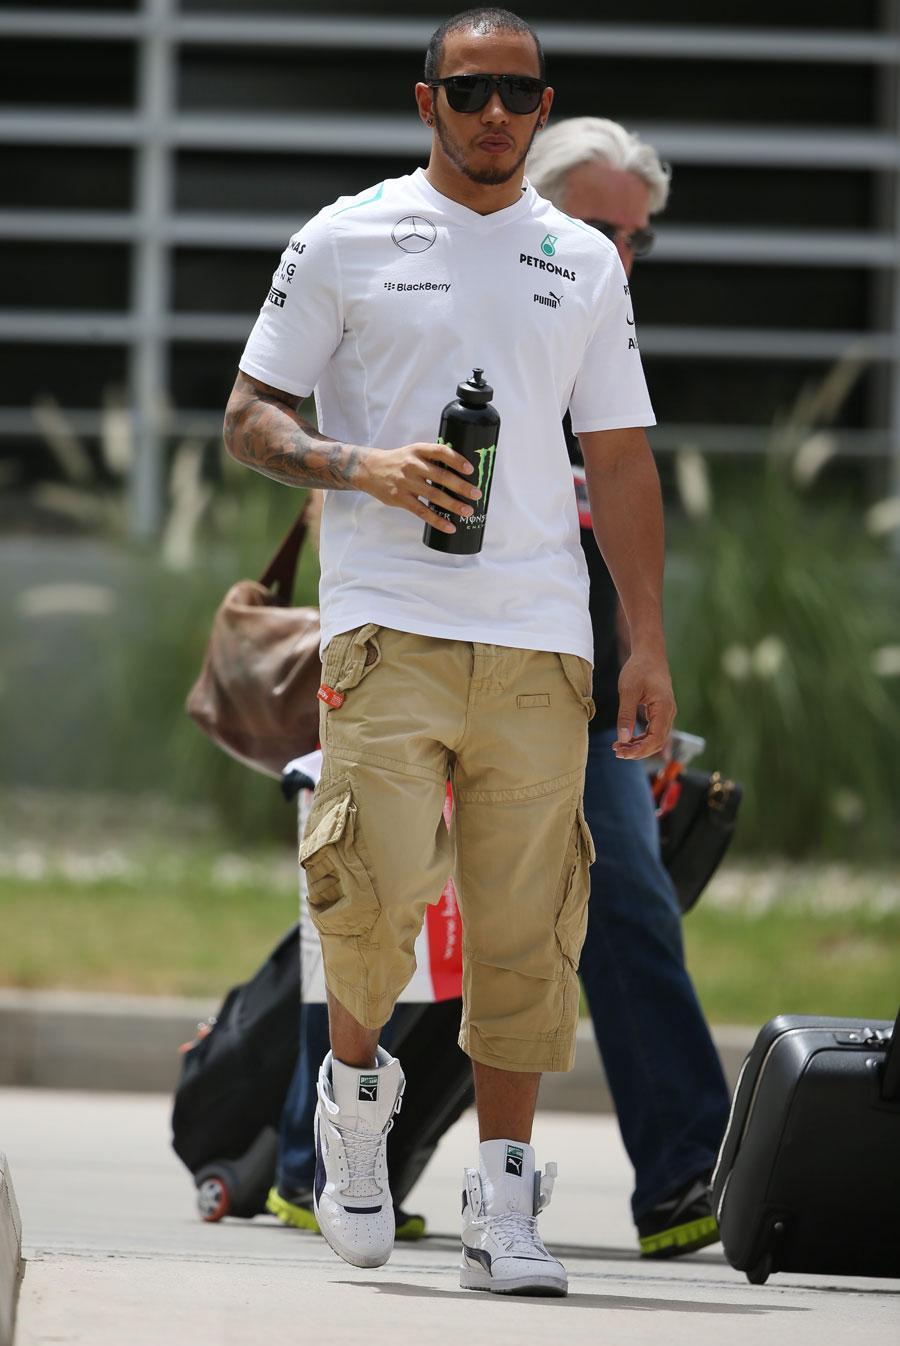 Lewis Hamilton walks through the paddock